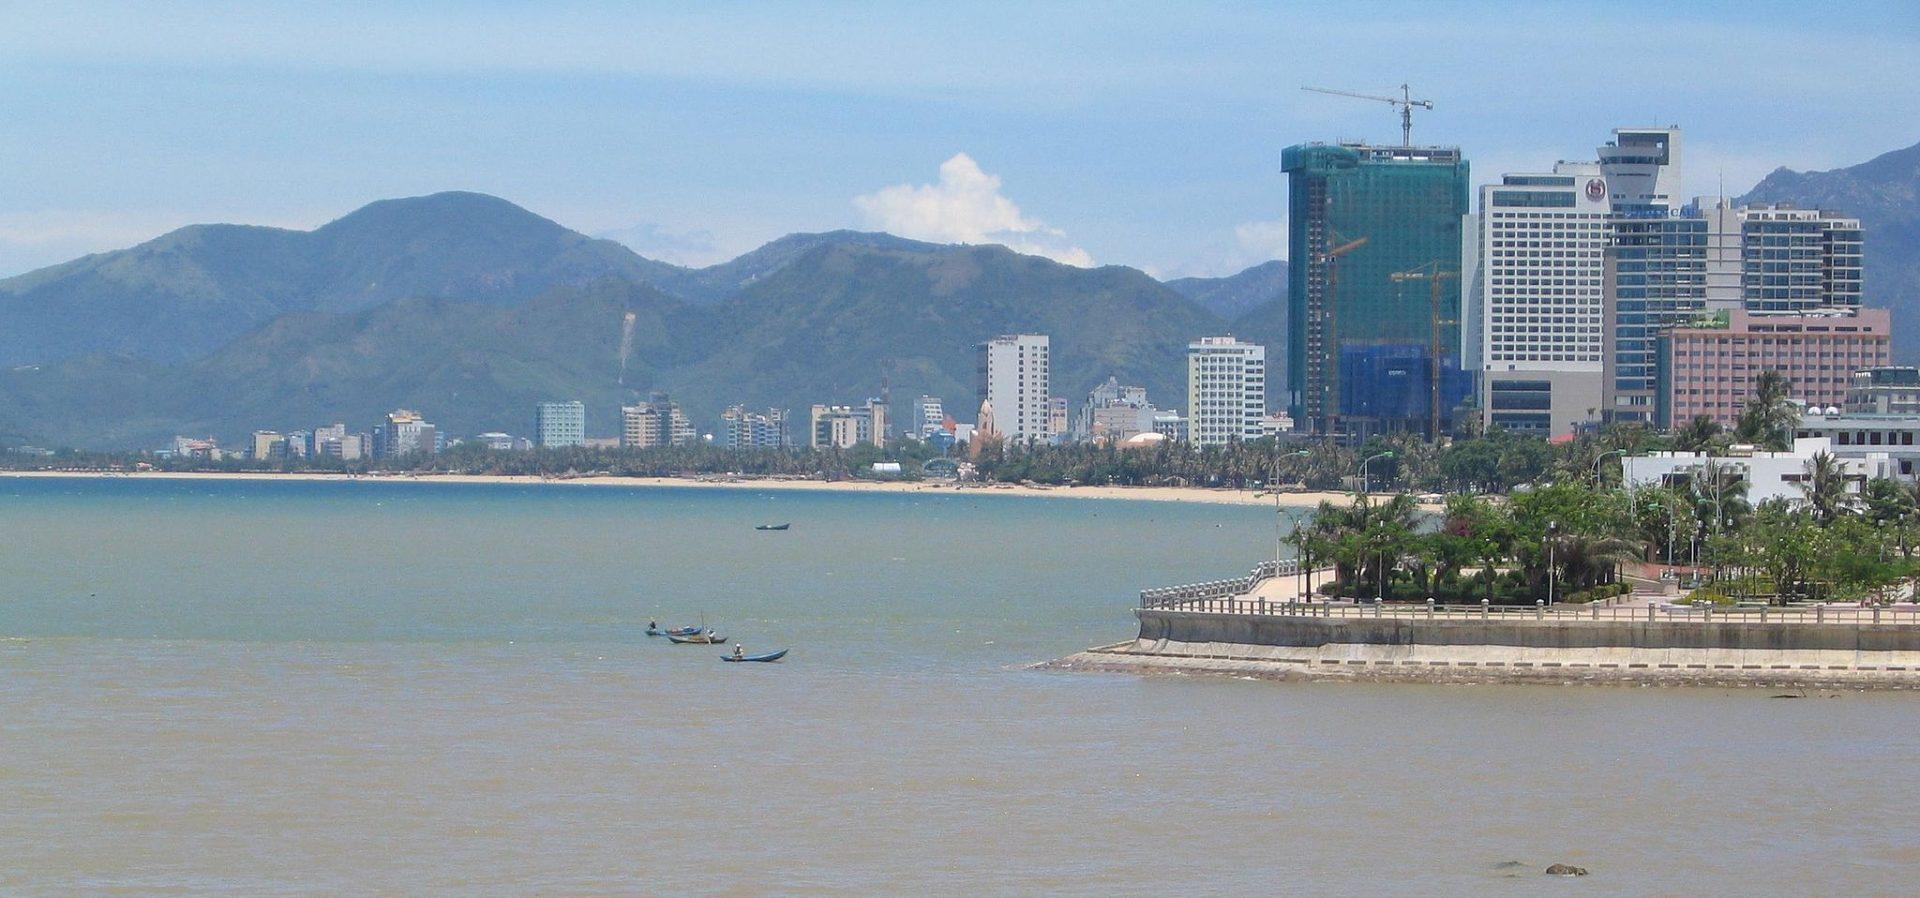 Nha Trang skyline 1